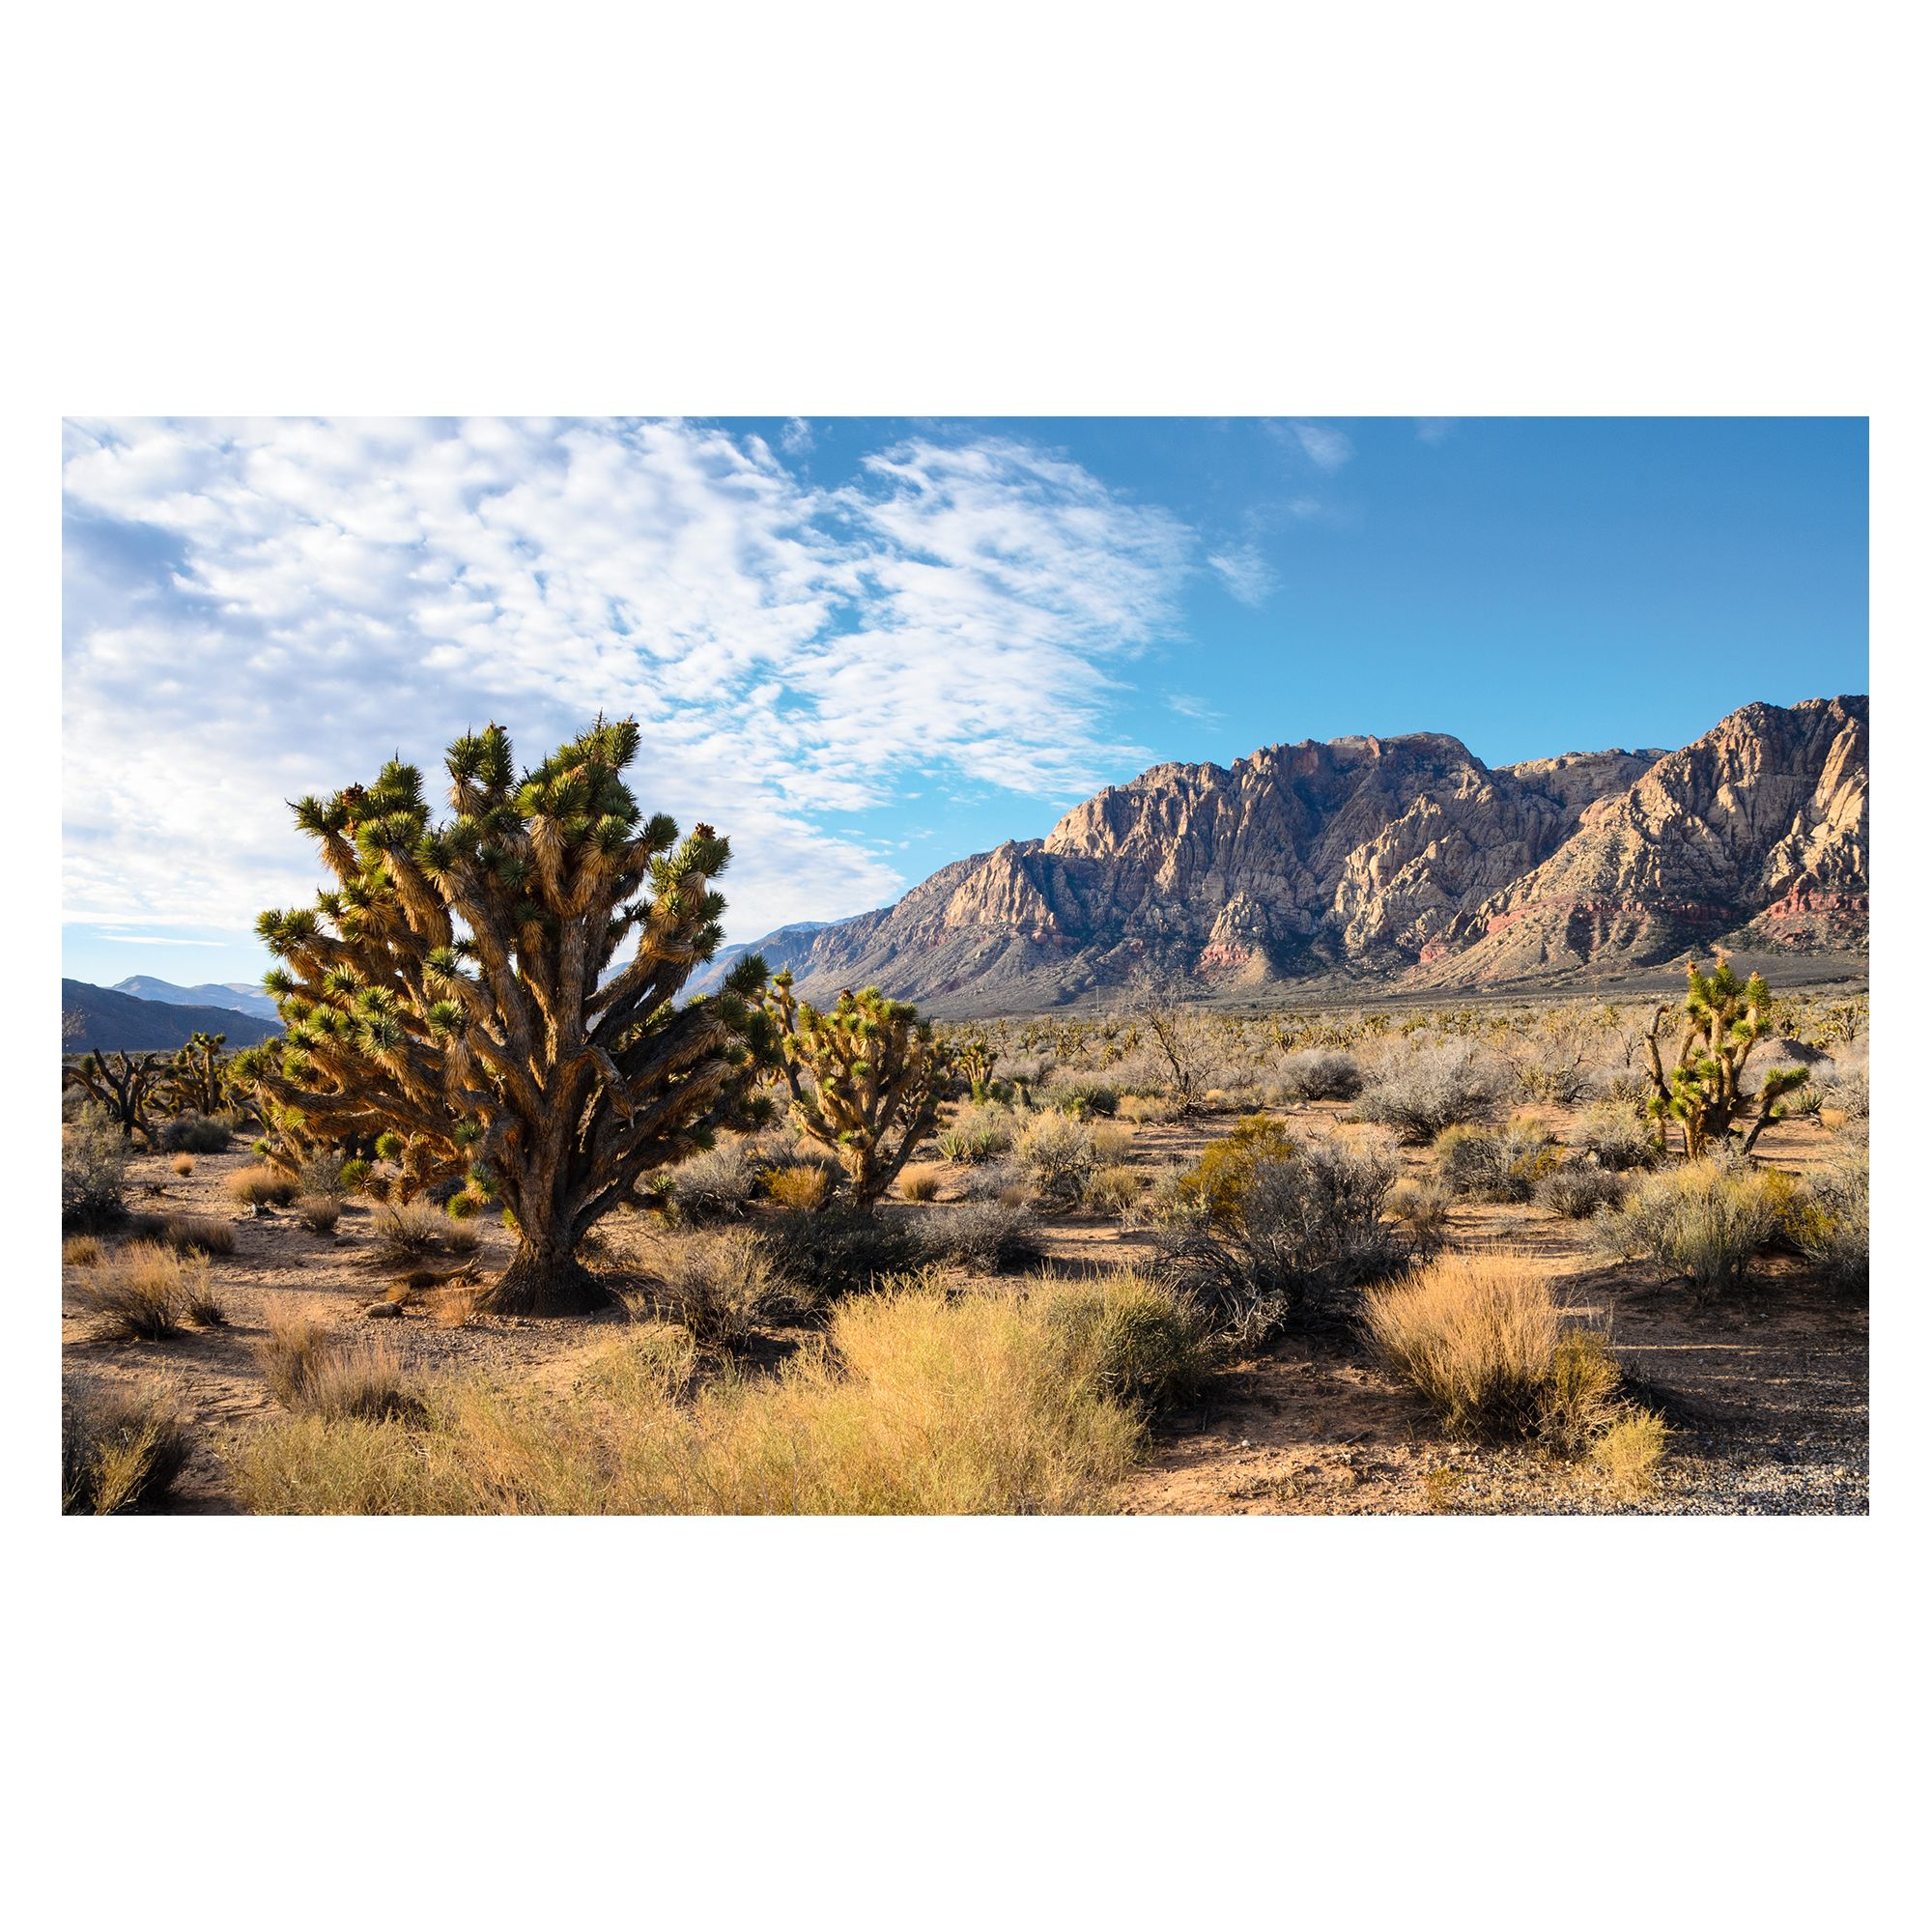 Thrive Desert Cling Background For Terrarium Reptile Habitat Decor Petsmart